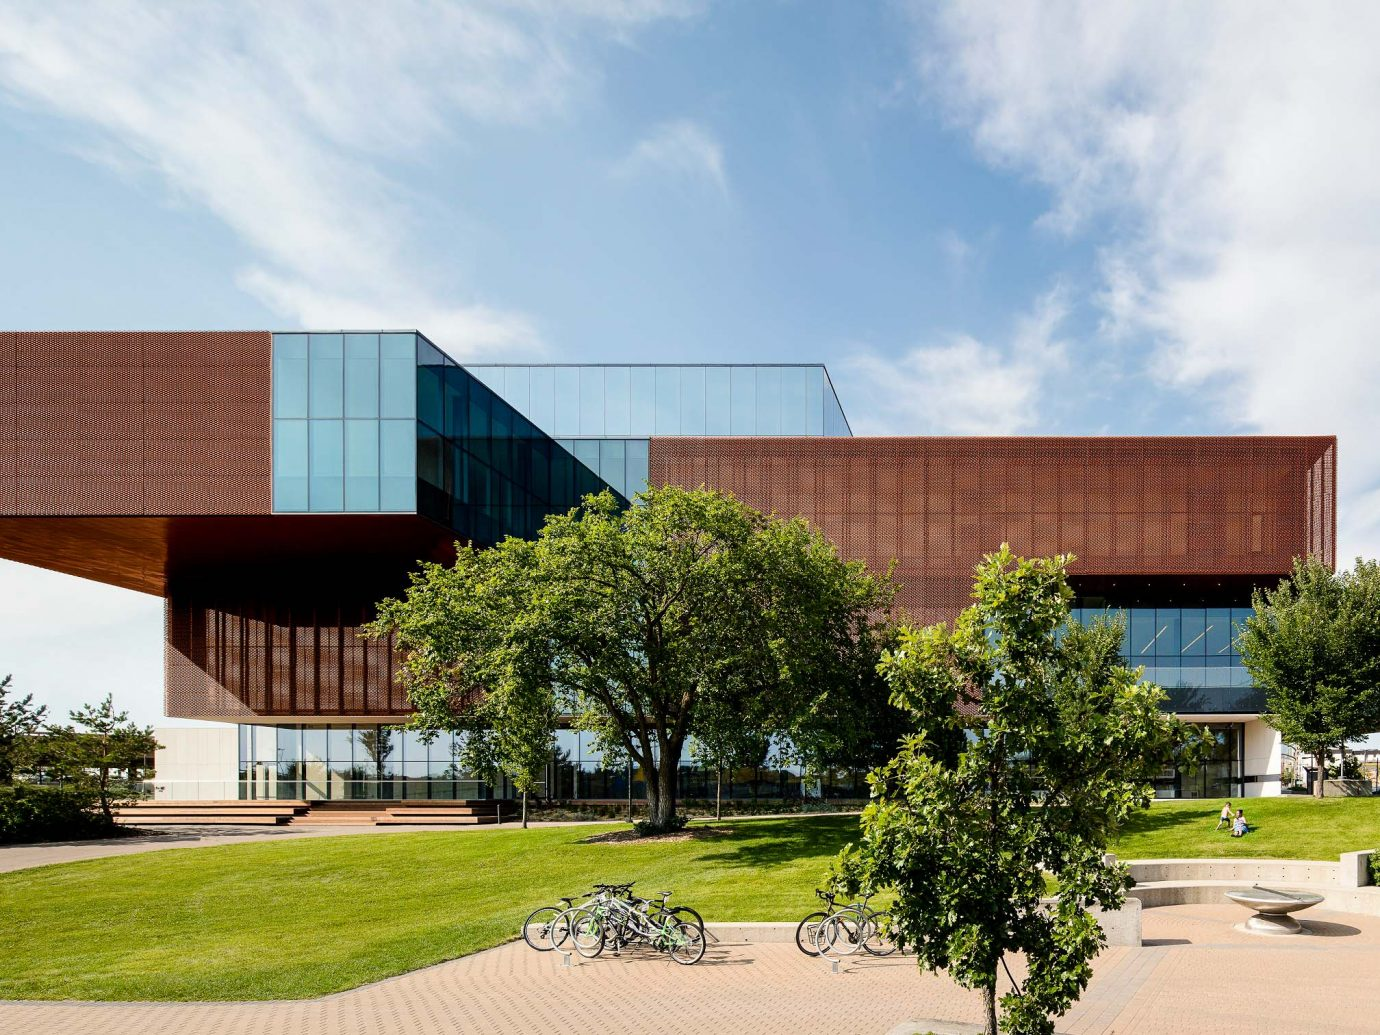 Remai Modern, Saskatoon, Saskatchewan museum exterior architecture lawn